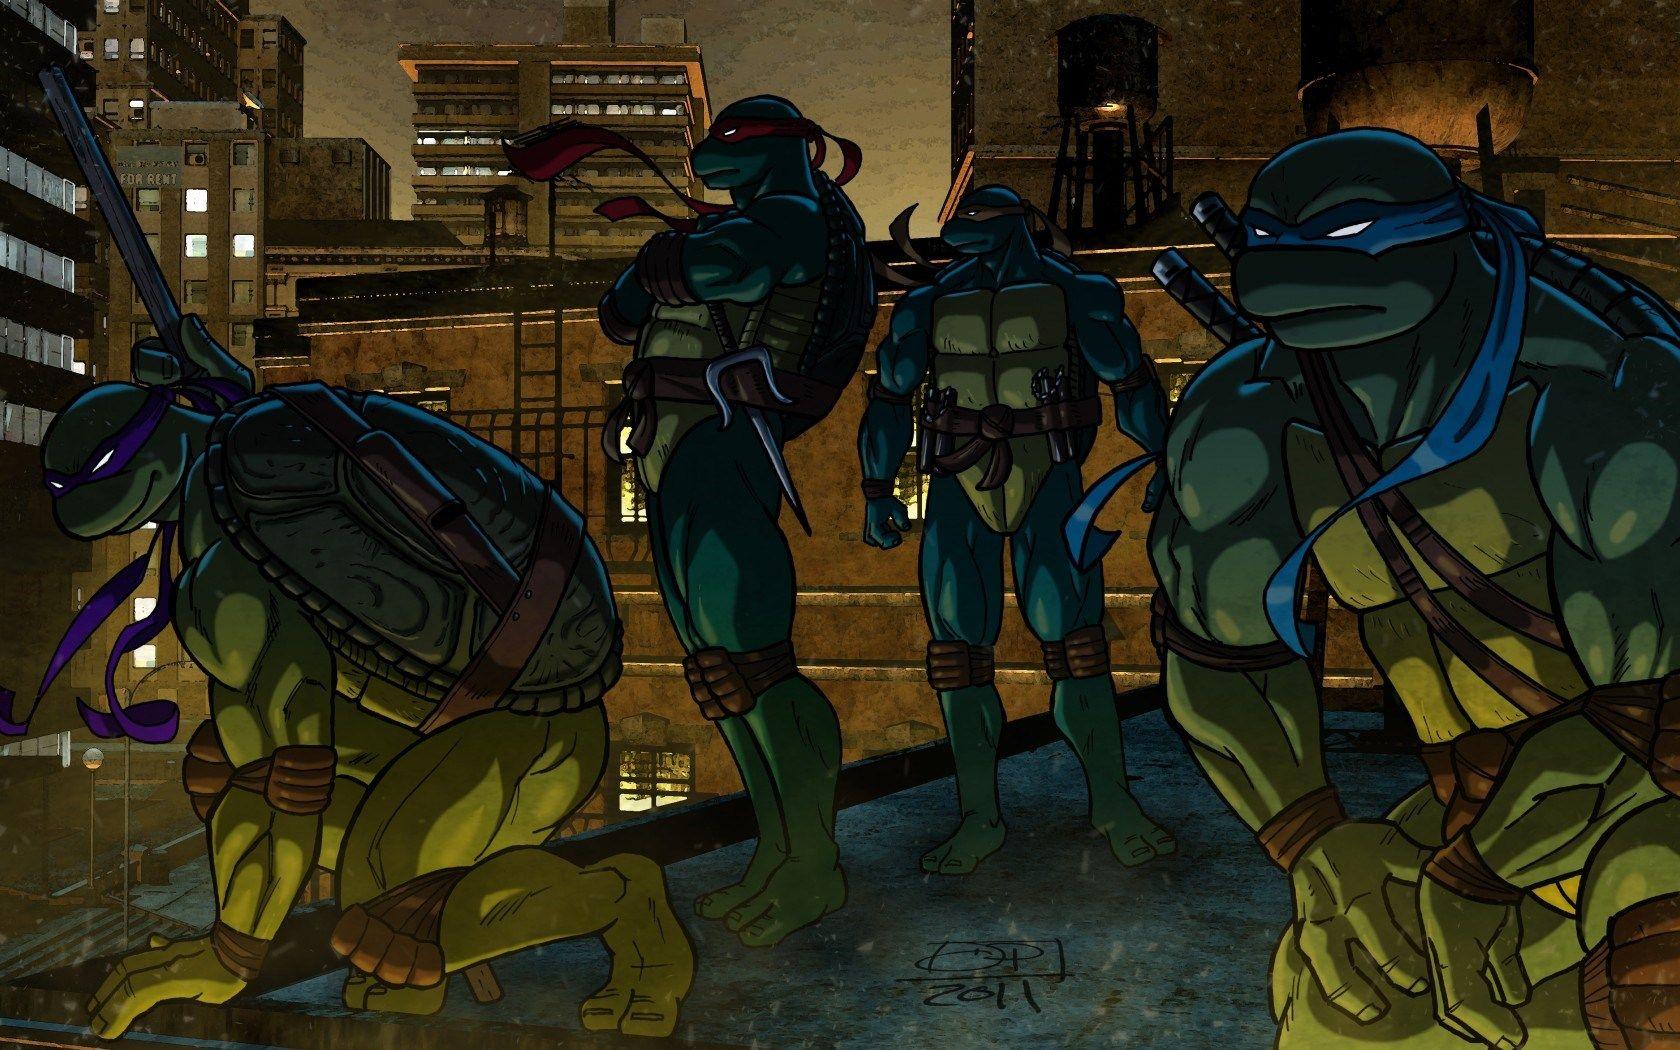 Cartoon Teenage Mutant Ninja Turtles Leonardo Raphael Michelangelo Donatello Hd Wallpaper 忍者タートルズ 忍者 タートルズ